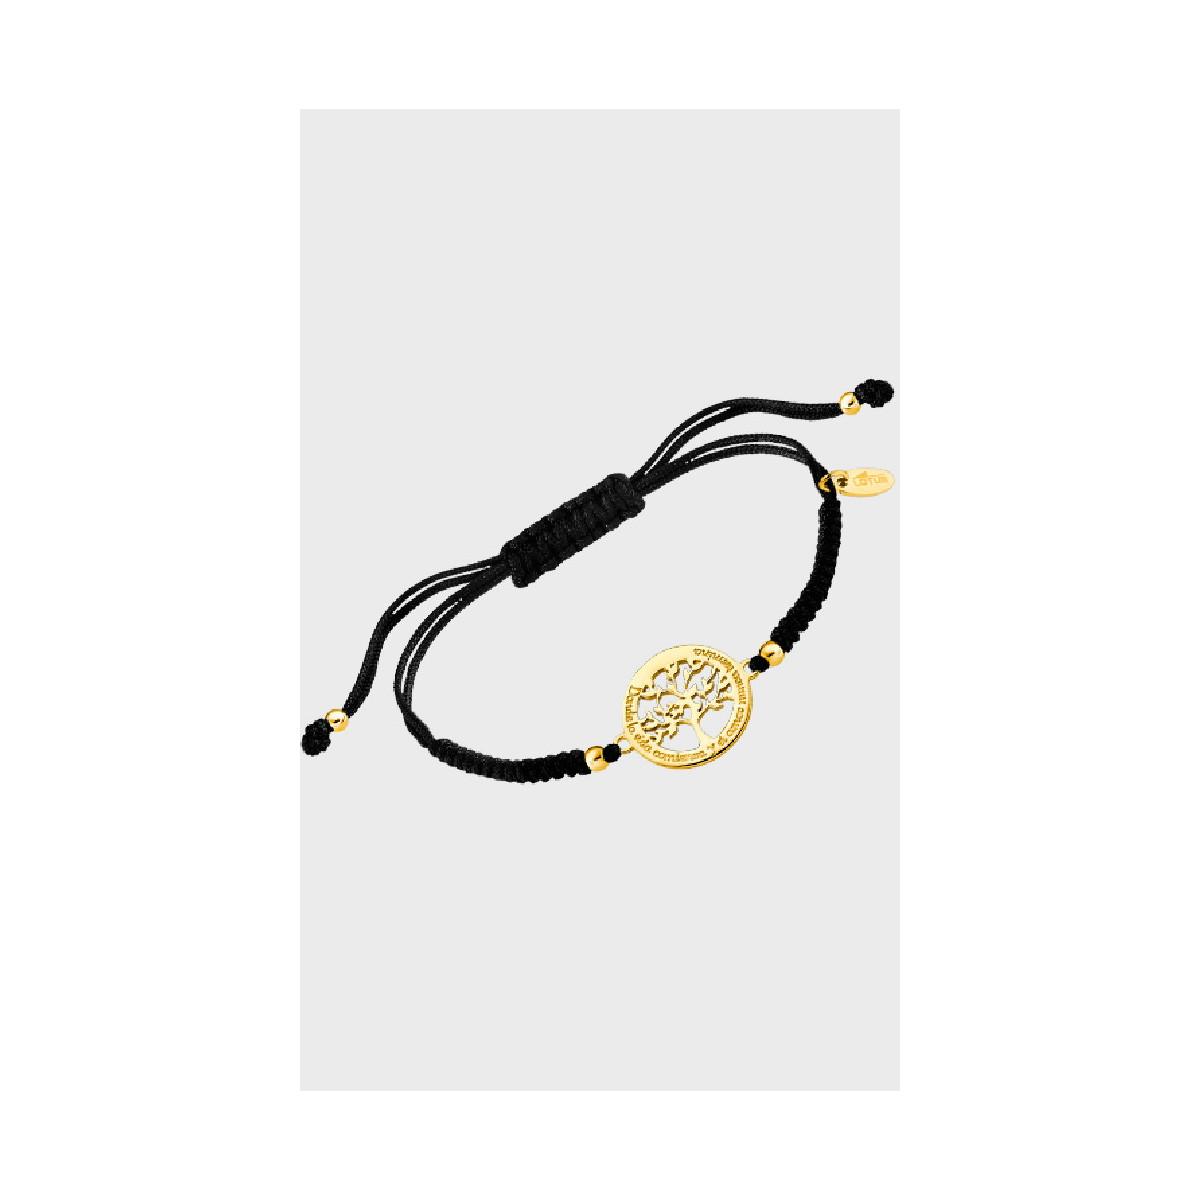 Lotus Silver Pulsera Sra.3n.arbol-frase - LP1641-2/5